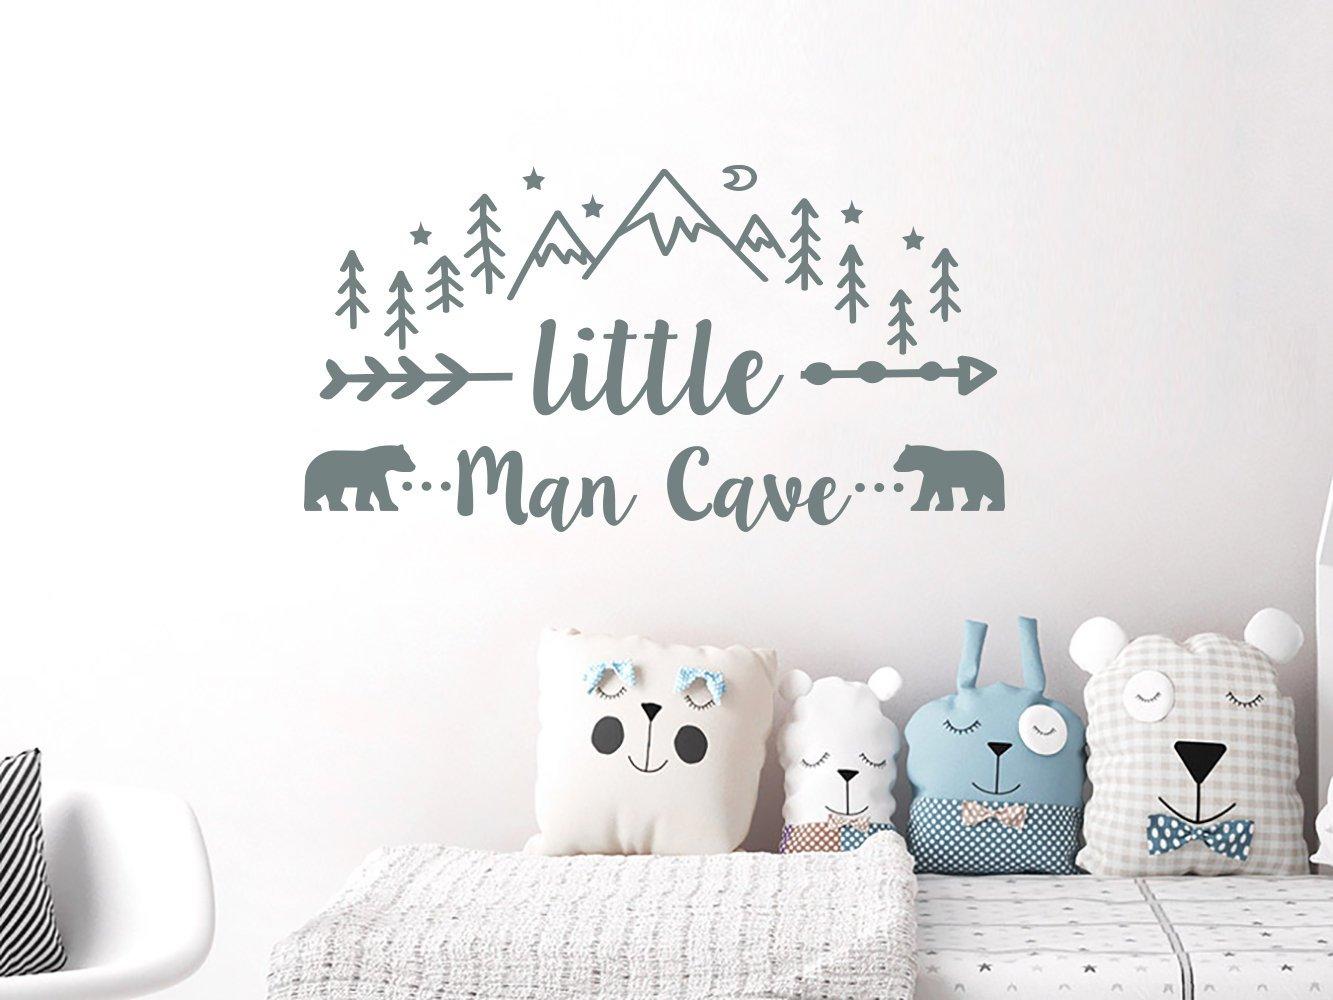 "N.SunForest Little Man Cave Wall Stickers Woodland Nursery Decor Mountains Nursery Rustic Decor Bear Decal Kids Room Man Cave Wall Decal 20""x38"""